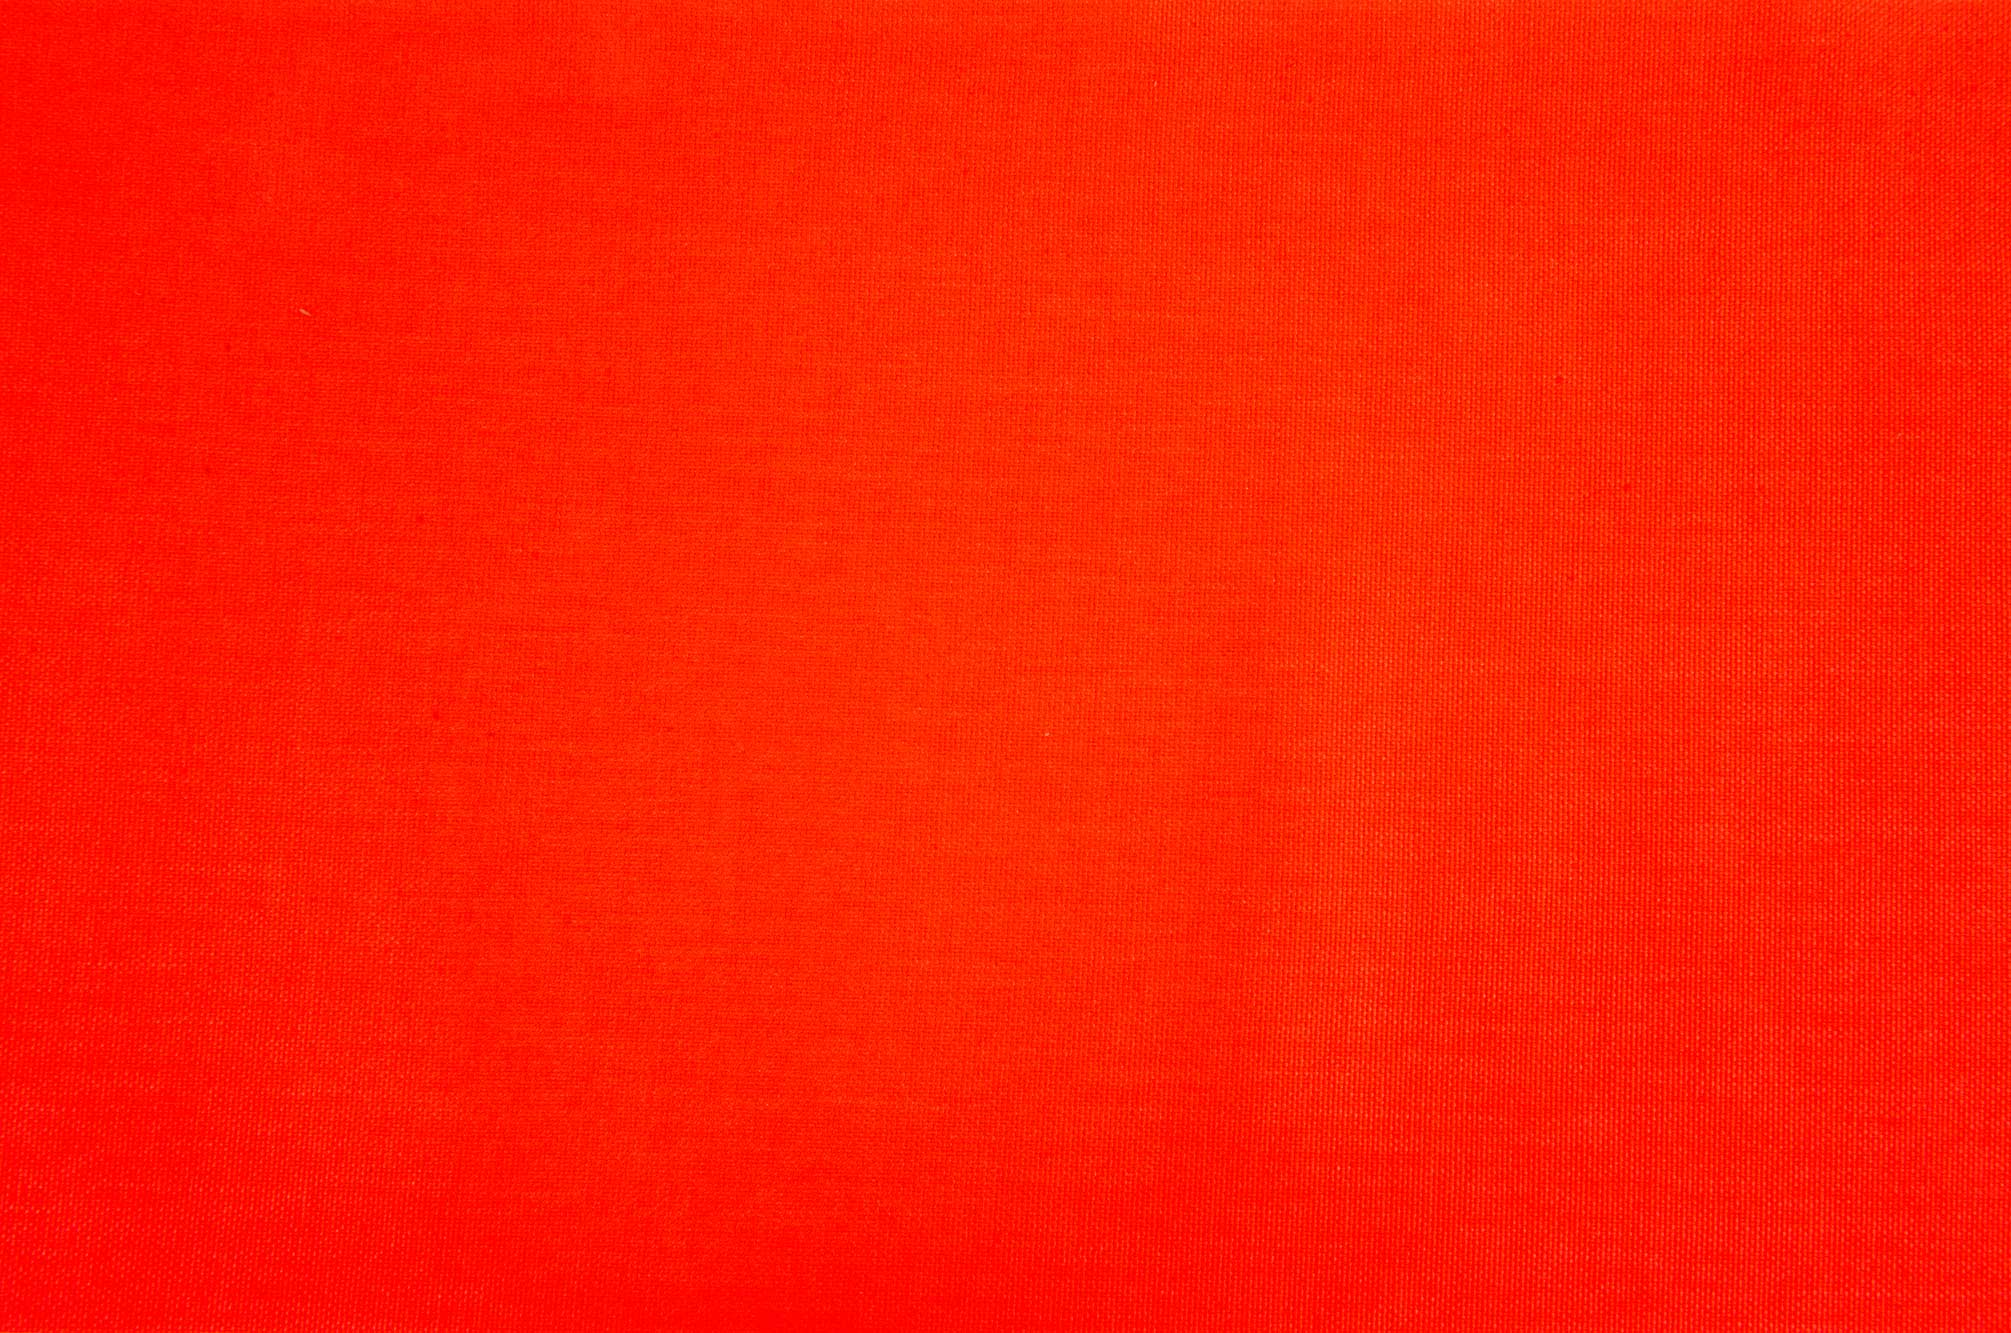 rescue-orange.jpg